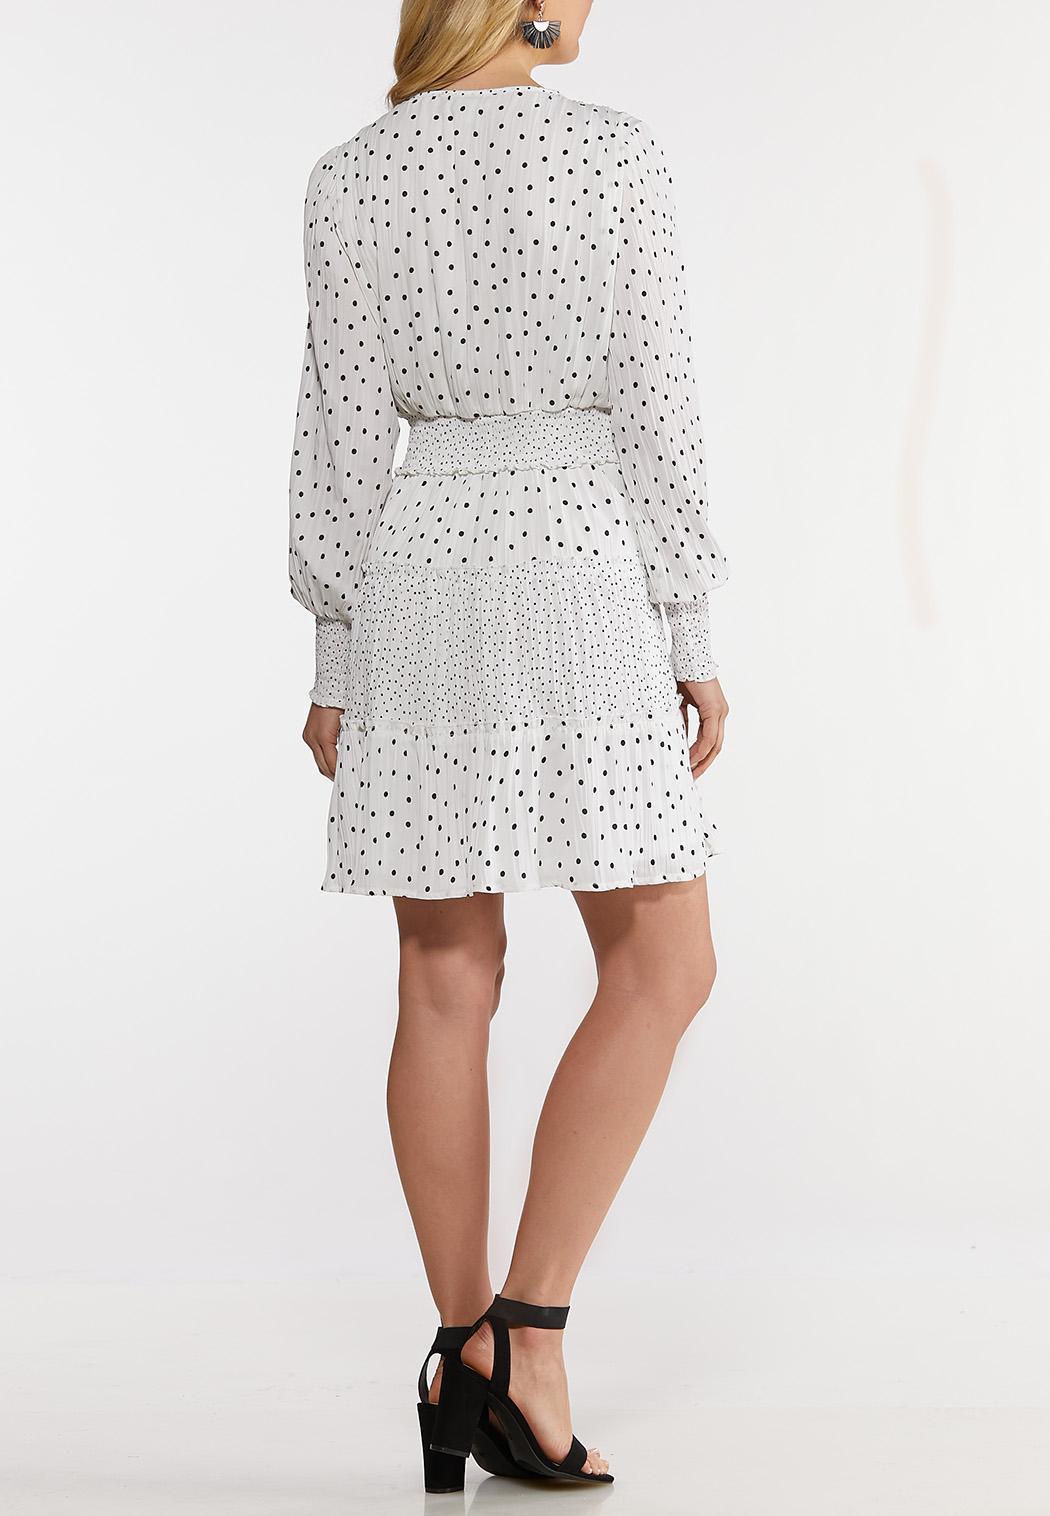 Black White Dotted Smocked Dress (Item #44153069)